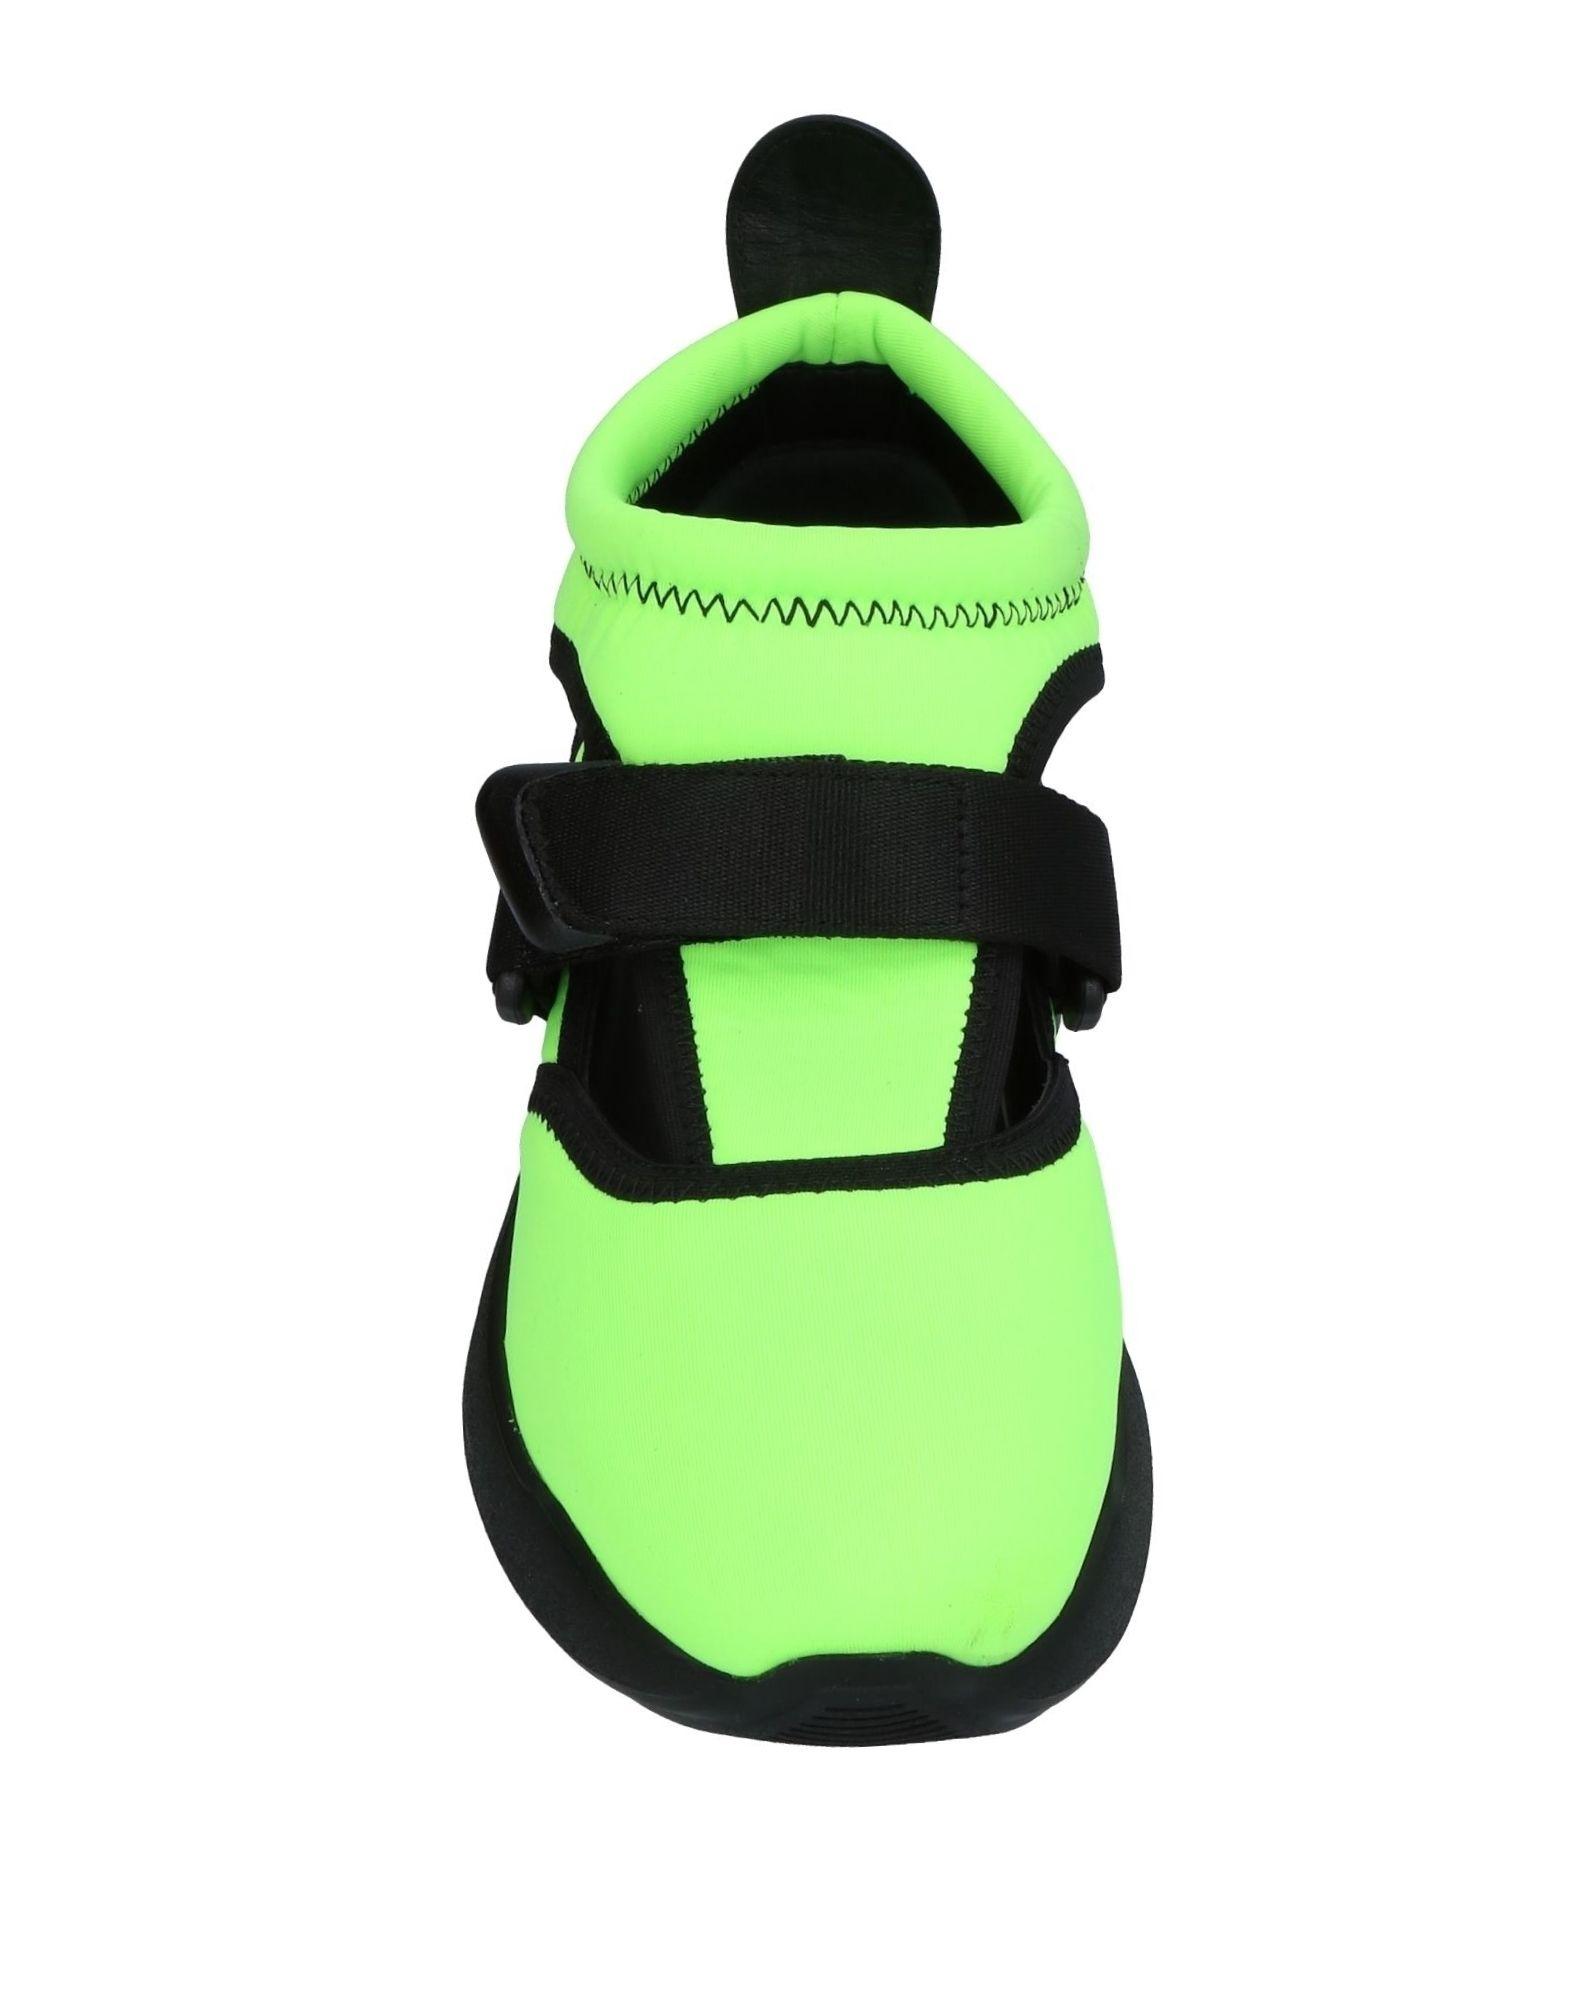 Msgm Heiße Sneakers Damen  11380660EQ Heiße Msgm Schuhe 55d998